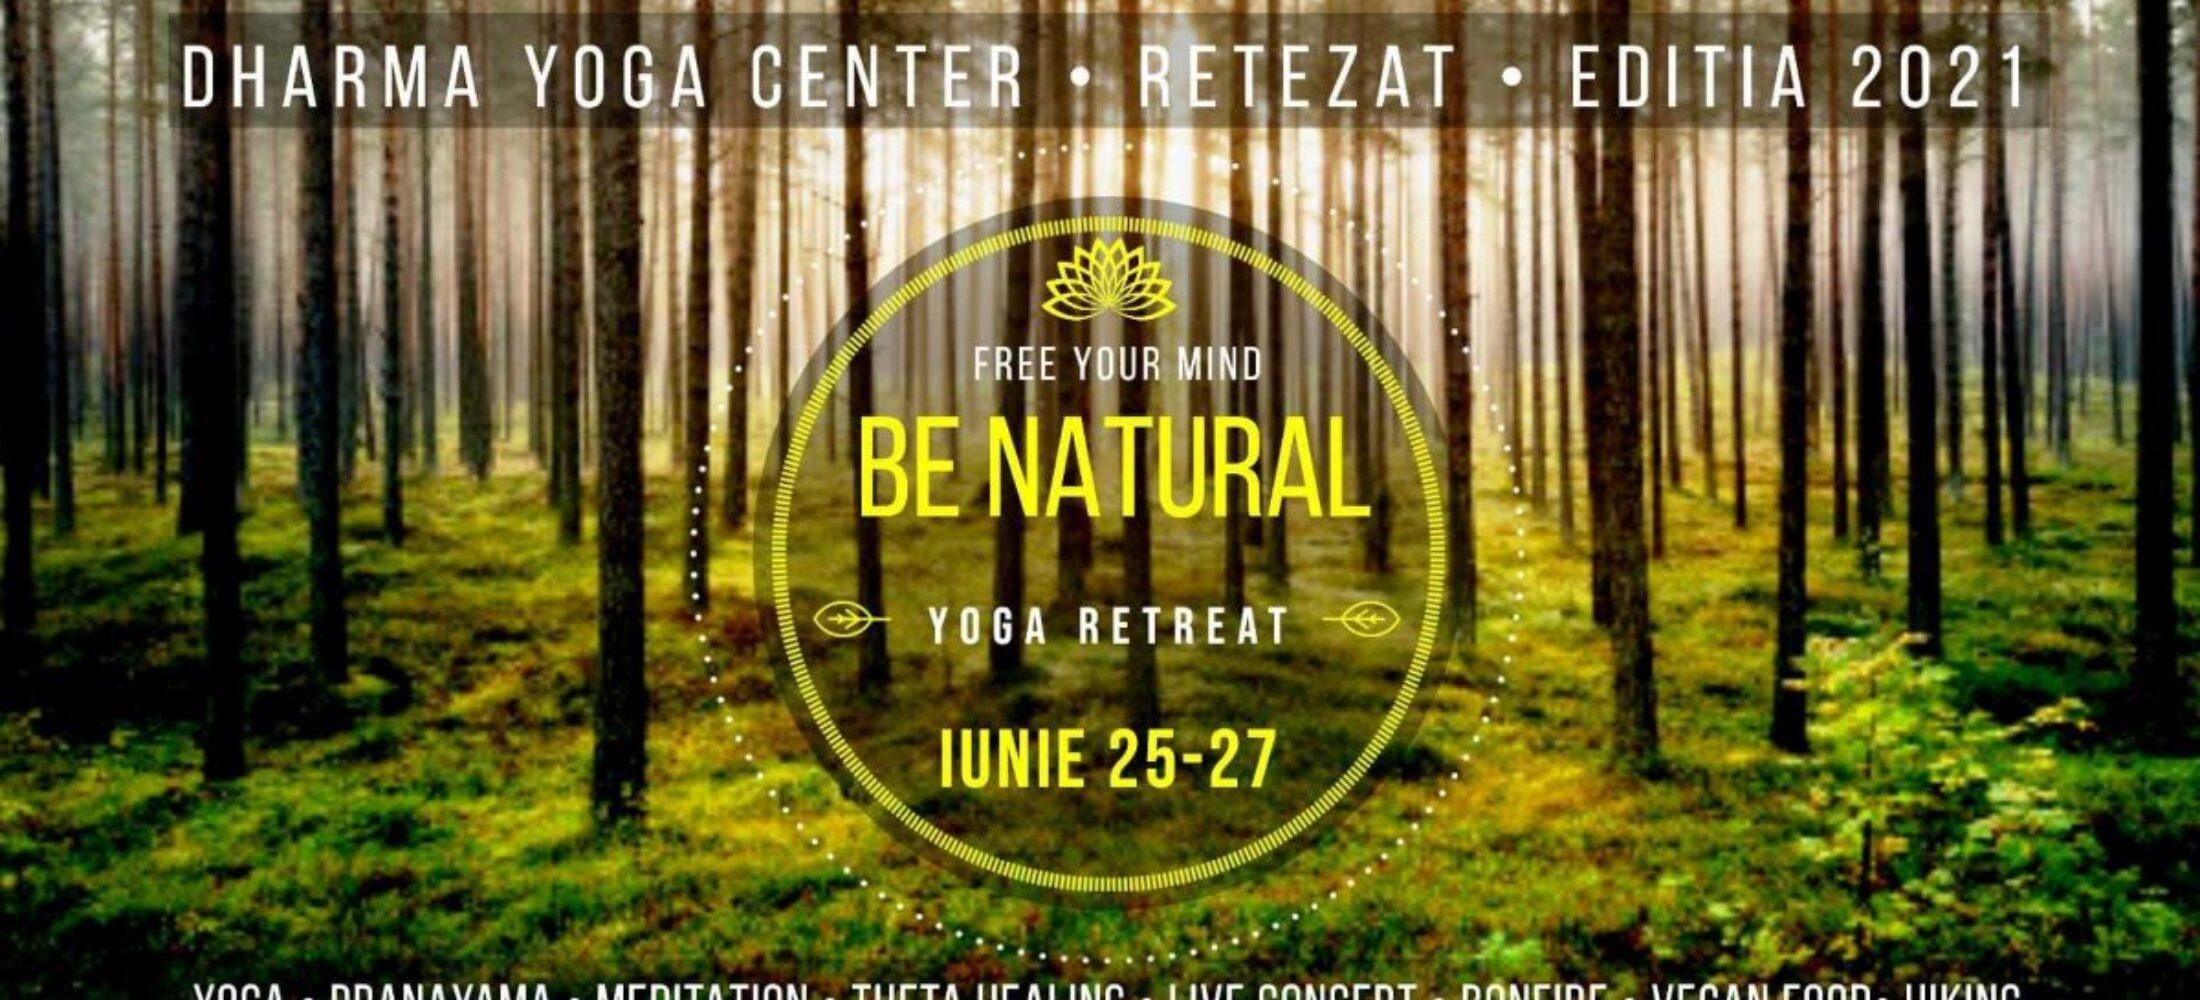 BE Natural Yoga Retreat - Rau de Mori, Retezat - Editia 2021